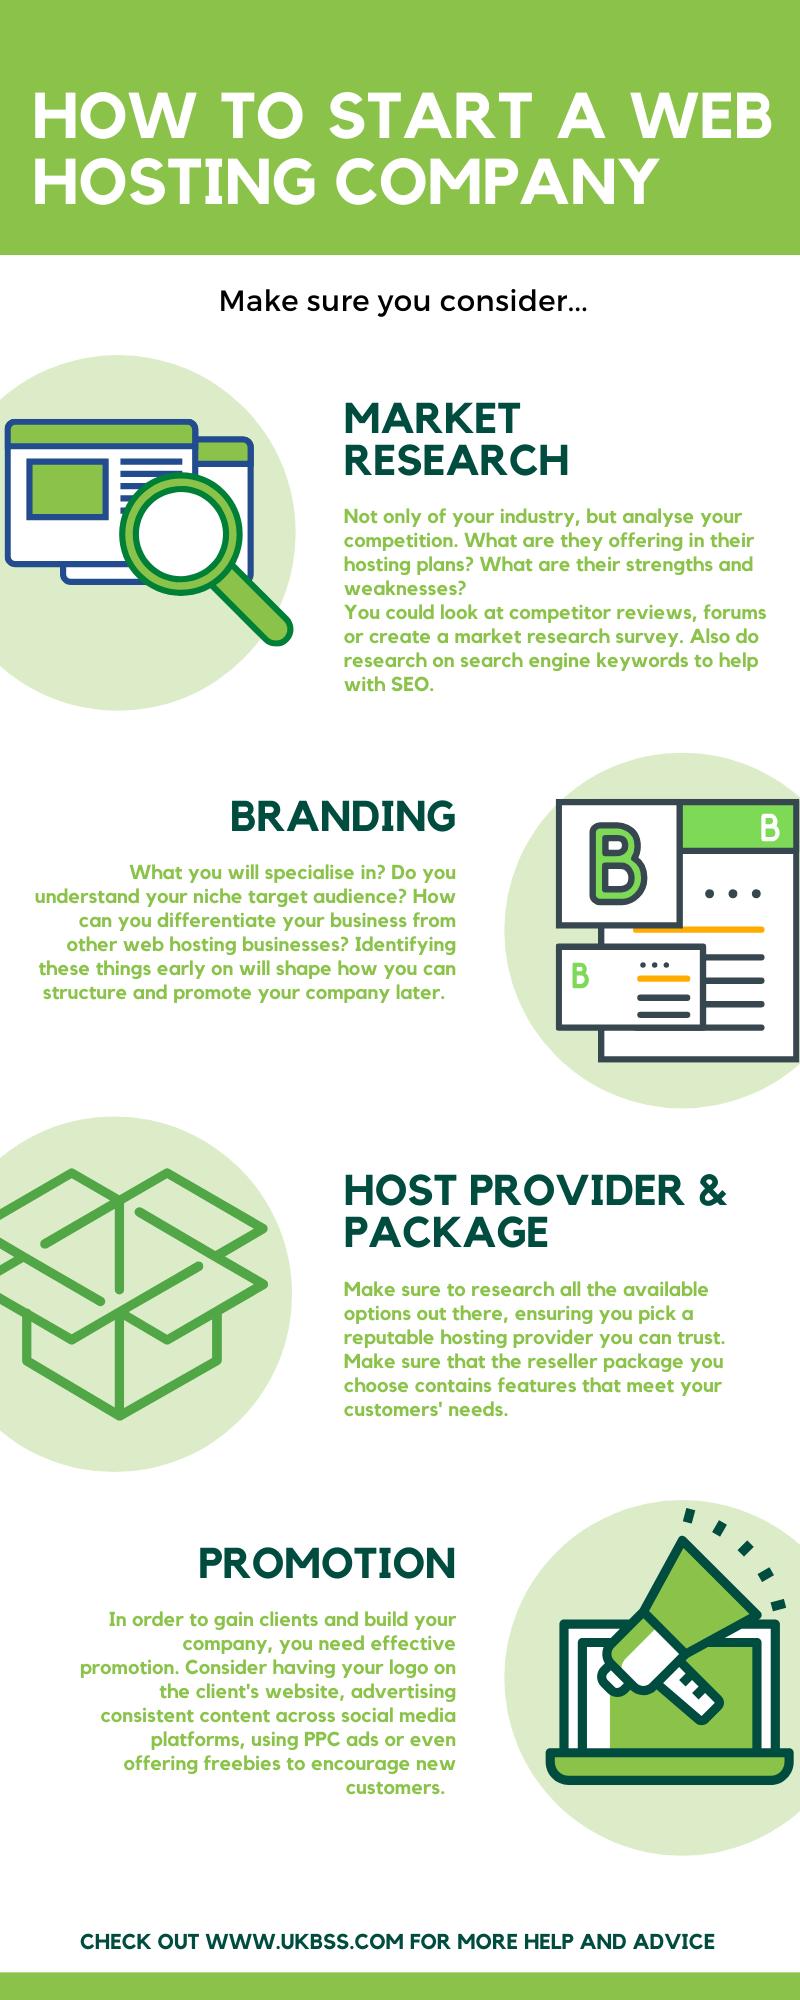 How to start a web hosting company